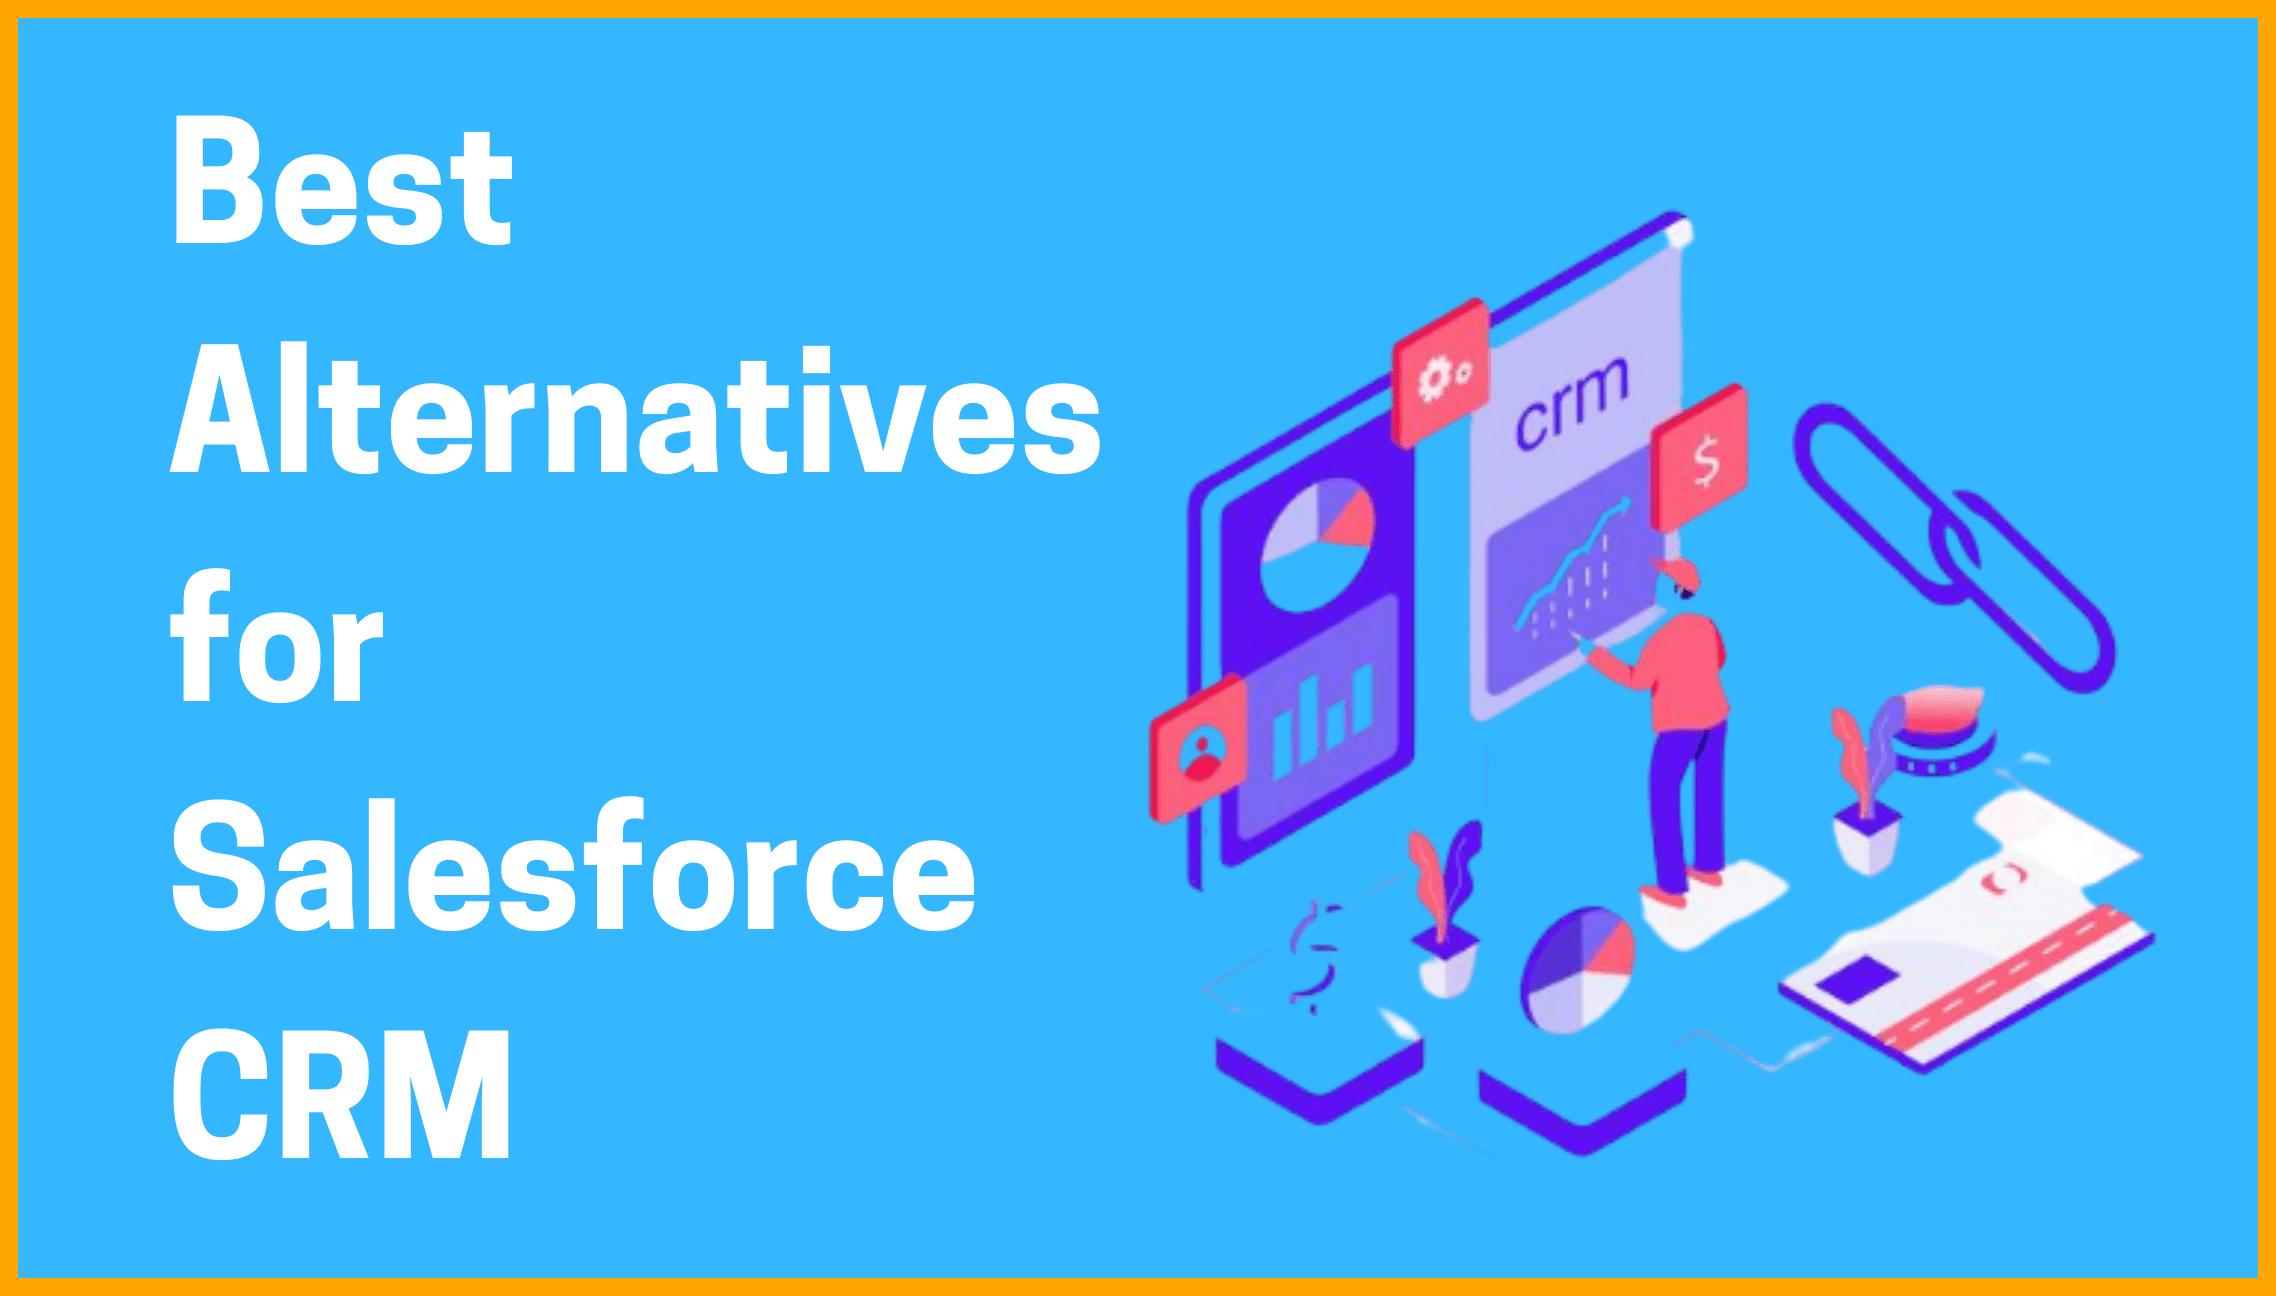 The Best Alternatives for Salesforce